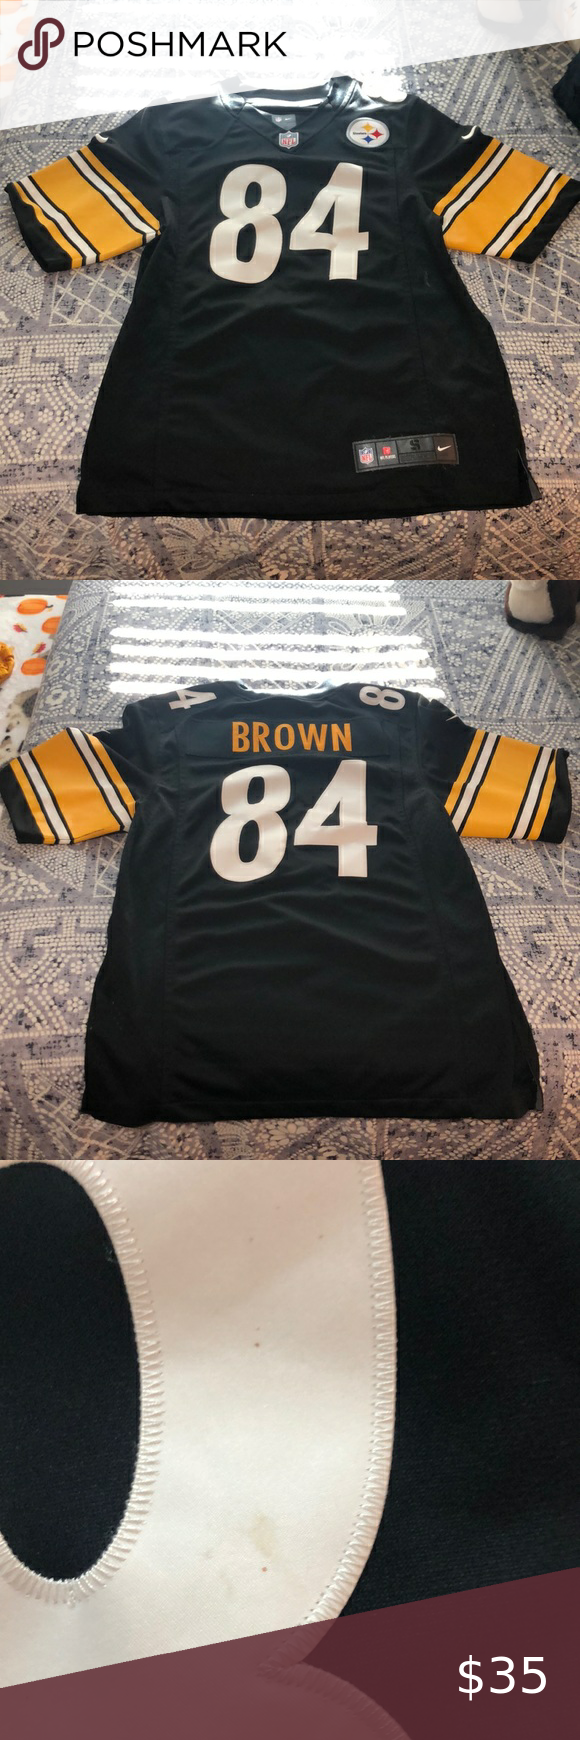 antonio brown jersey stitched